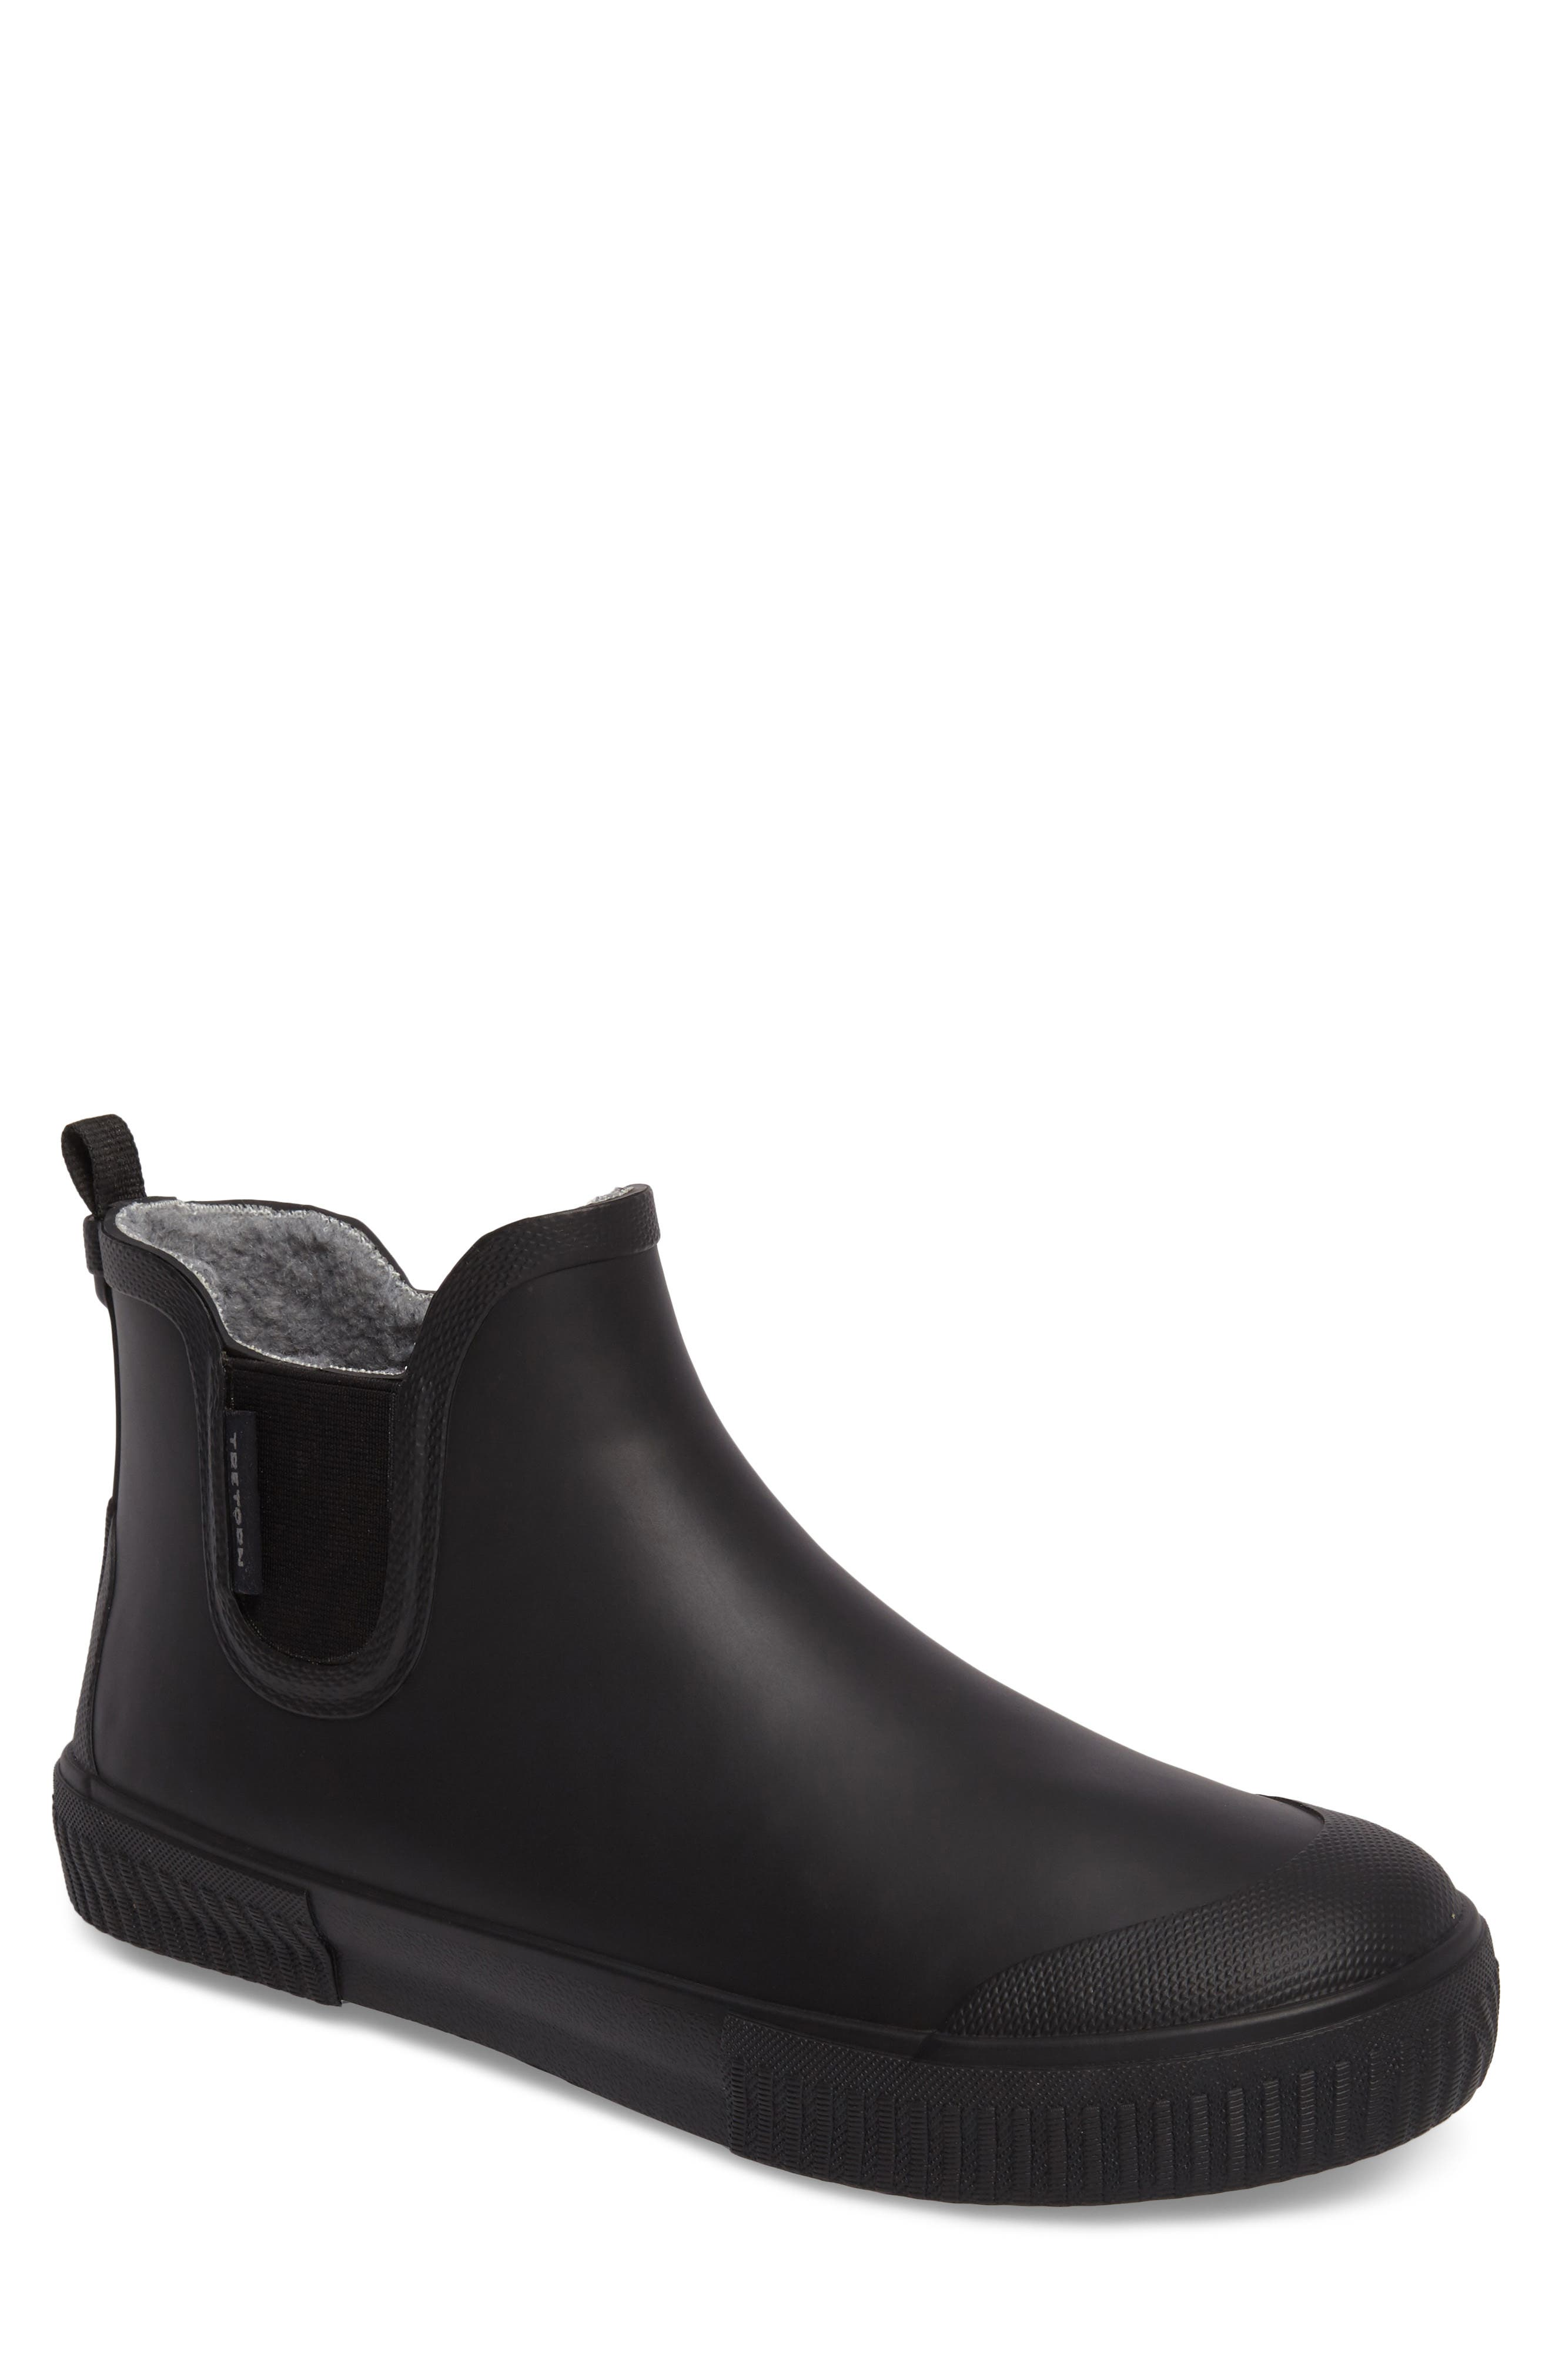 TRETORN, Guswnt Chelsea Waterproof Boot, Main thumbnail 1, color, BLACK/ BLACK